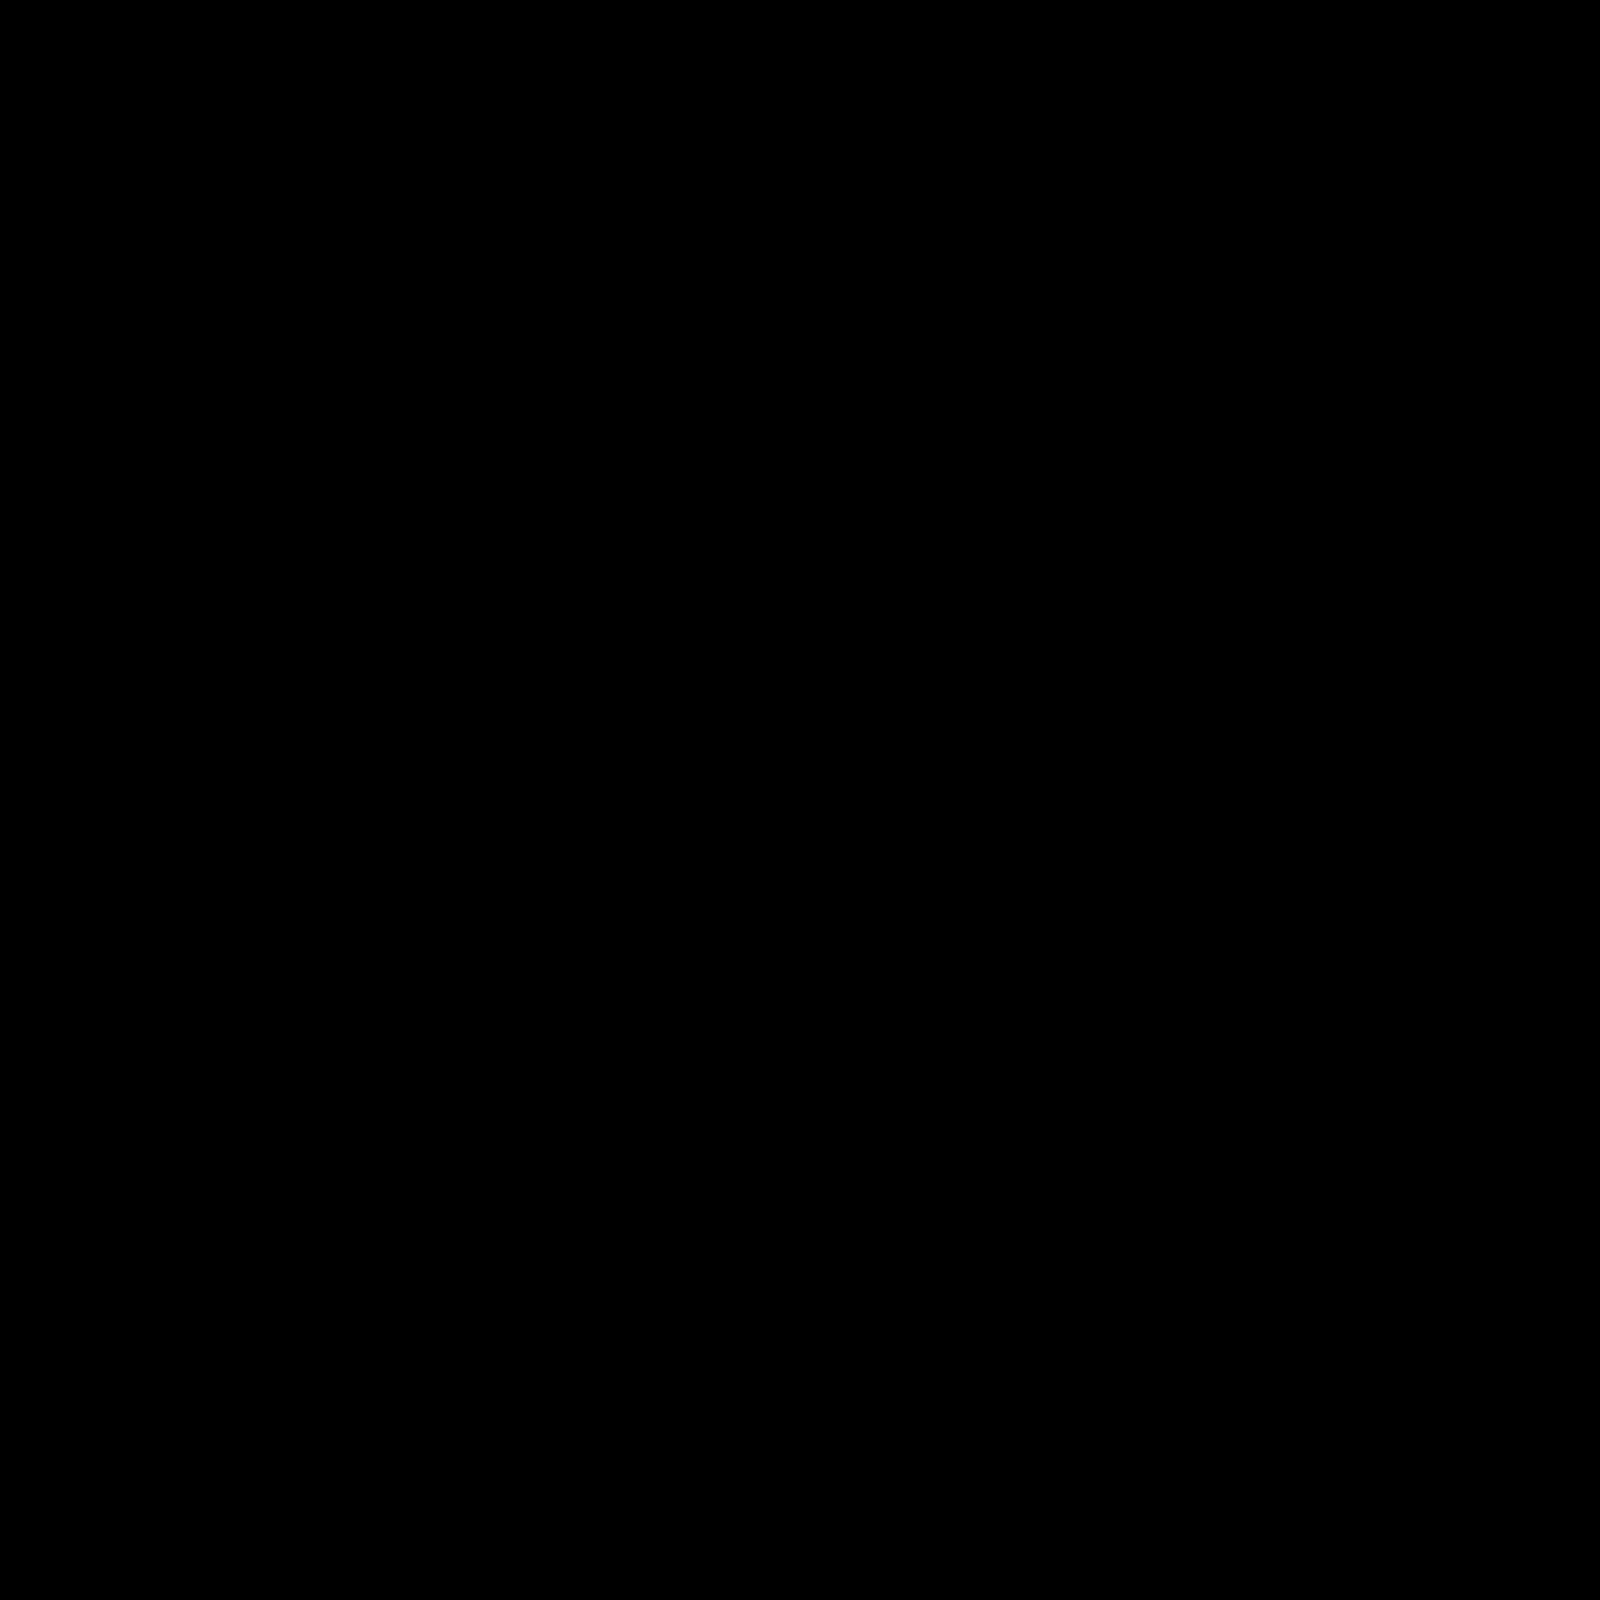 Jacket Filled icon